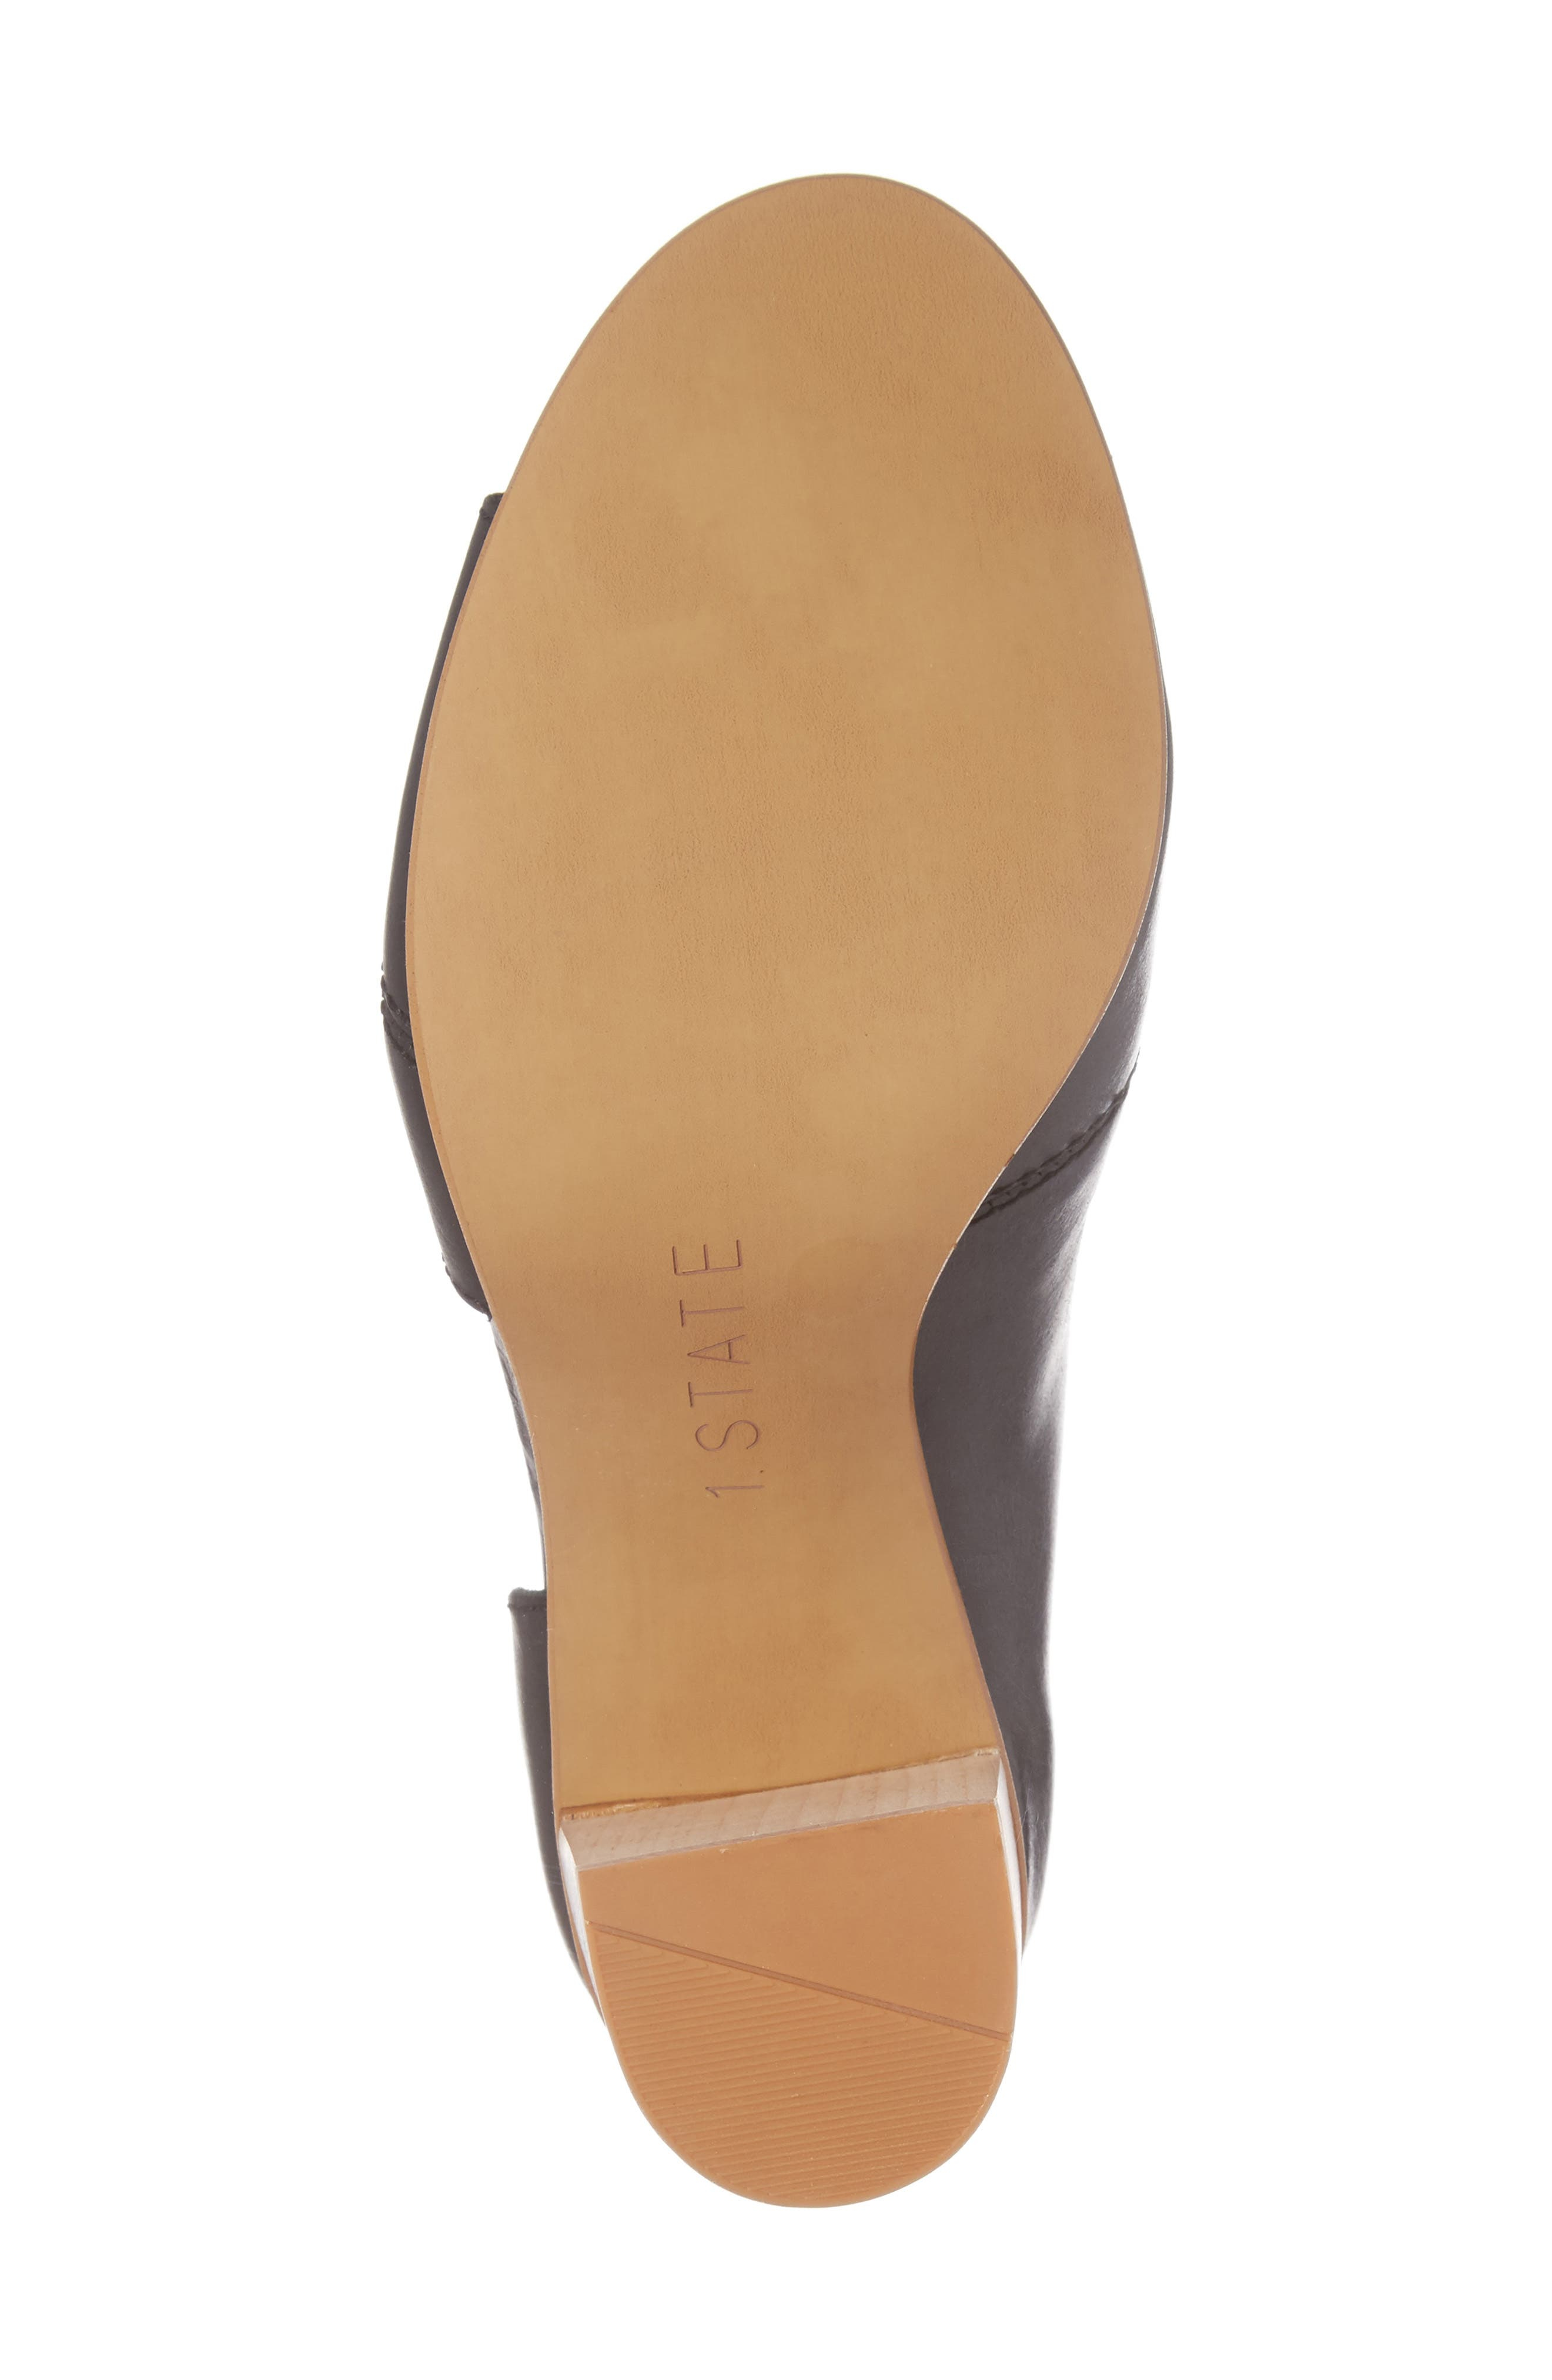 Amble Asymmetrical Sandal,                             Alternate thumbnail 6, color,                             001